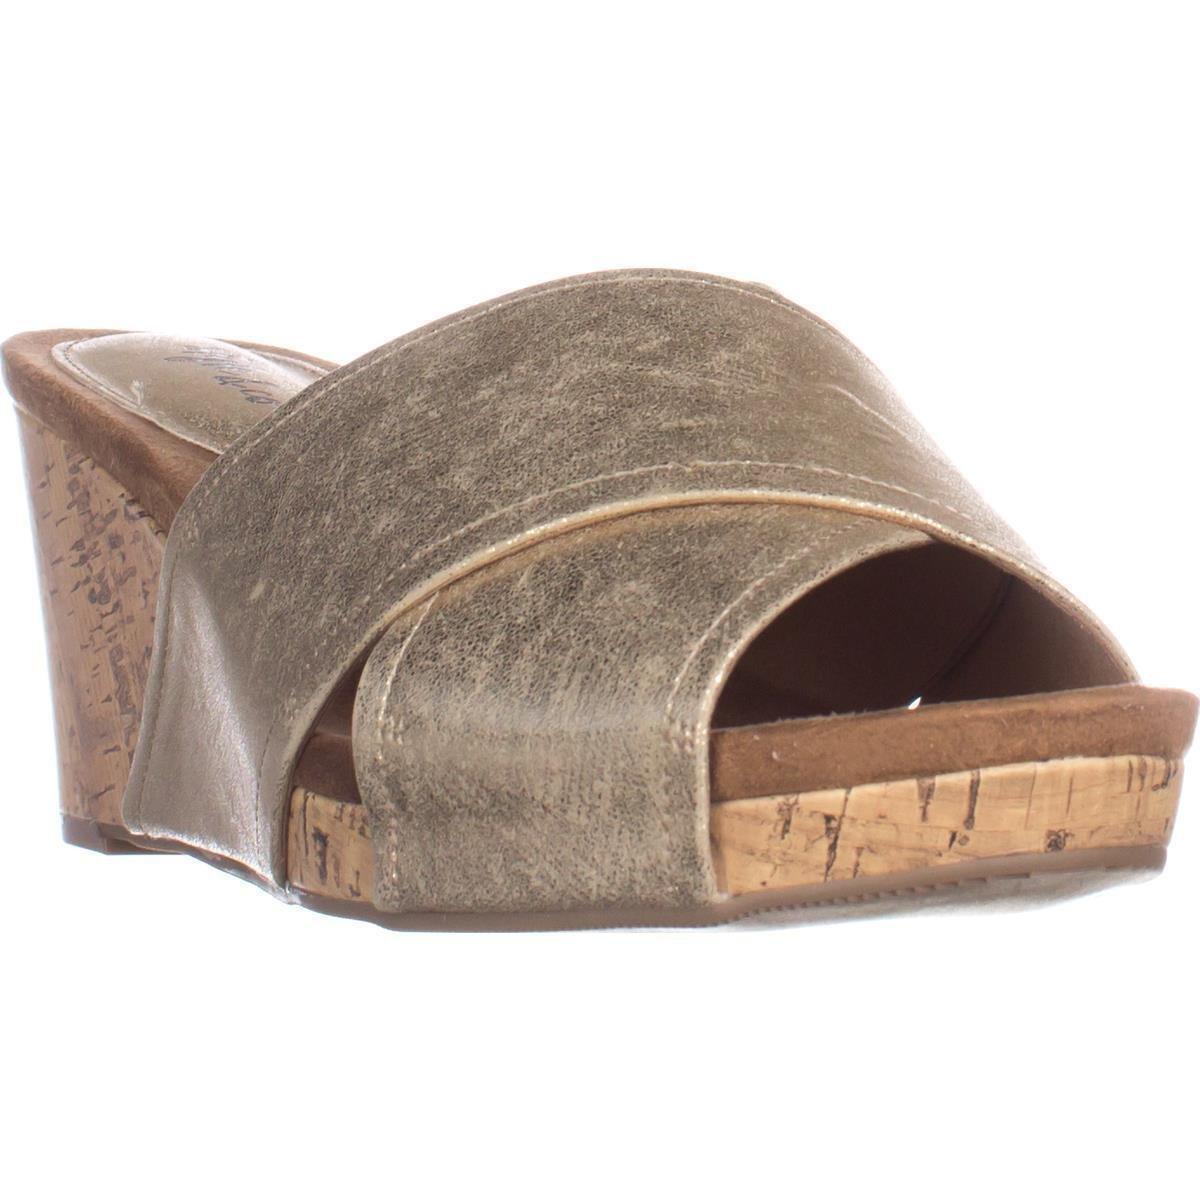 42d0635fd9e6 Womens Jilleep Open Toe Casual Casual Casual Platform Sandals B078NBJFXW 10  B